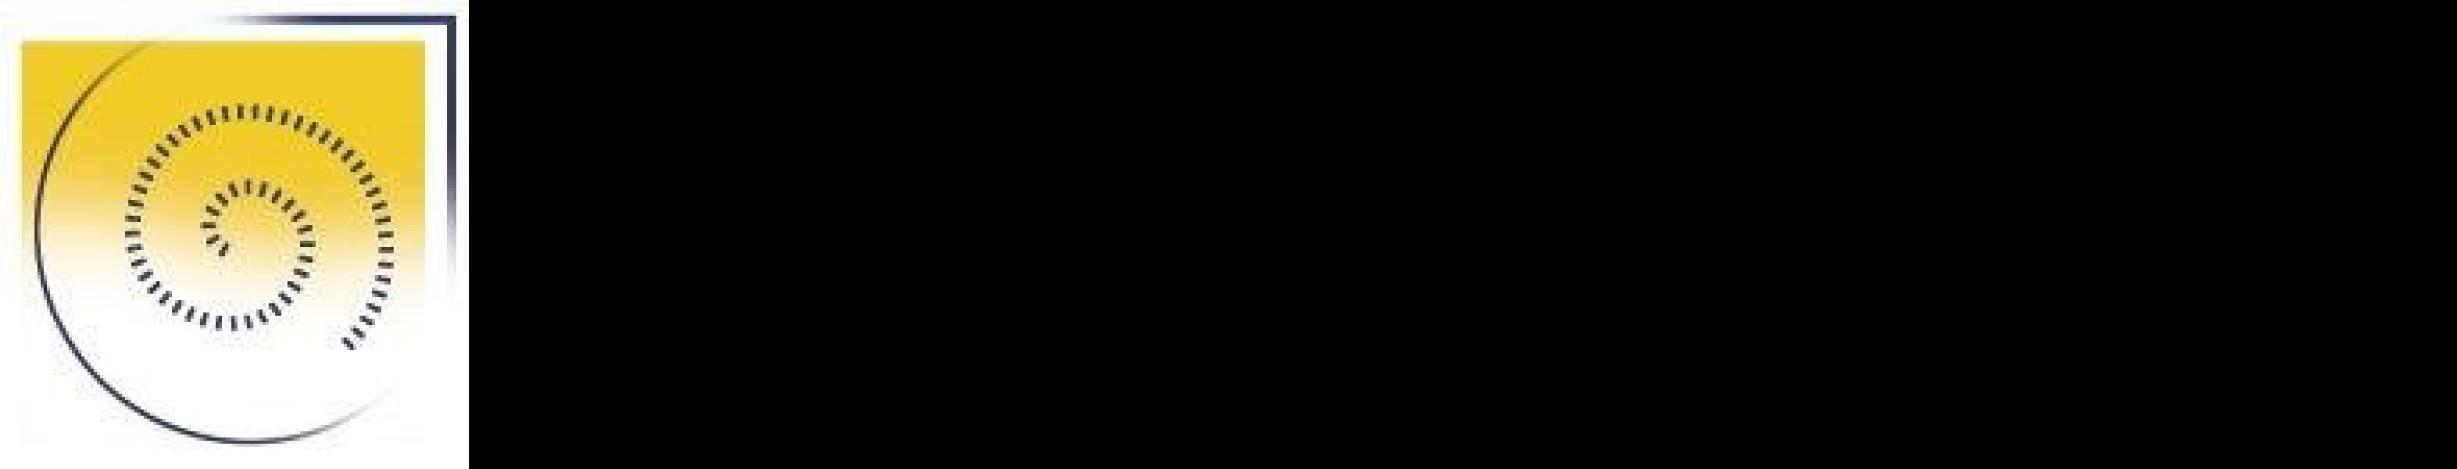 Logo | Praxis Dr. Katarina Schmidtova in 40597 Düsseldorf